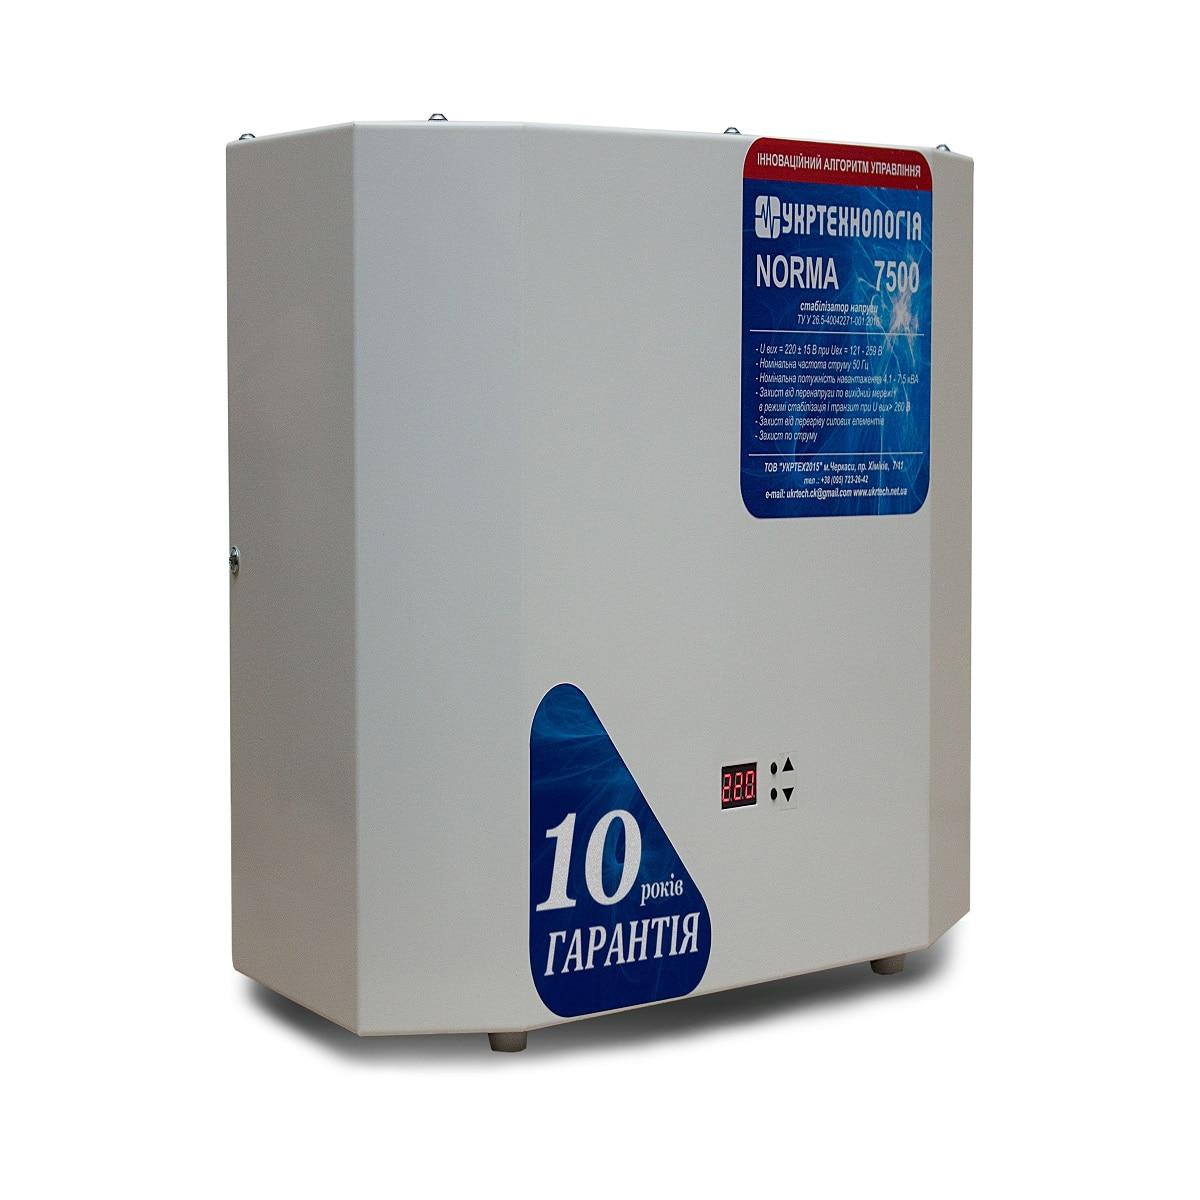 Для дома - Стабилизатор напряжения 7,5 кВт NORMA 000001375 - Фото 3